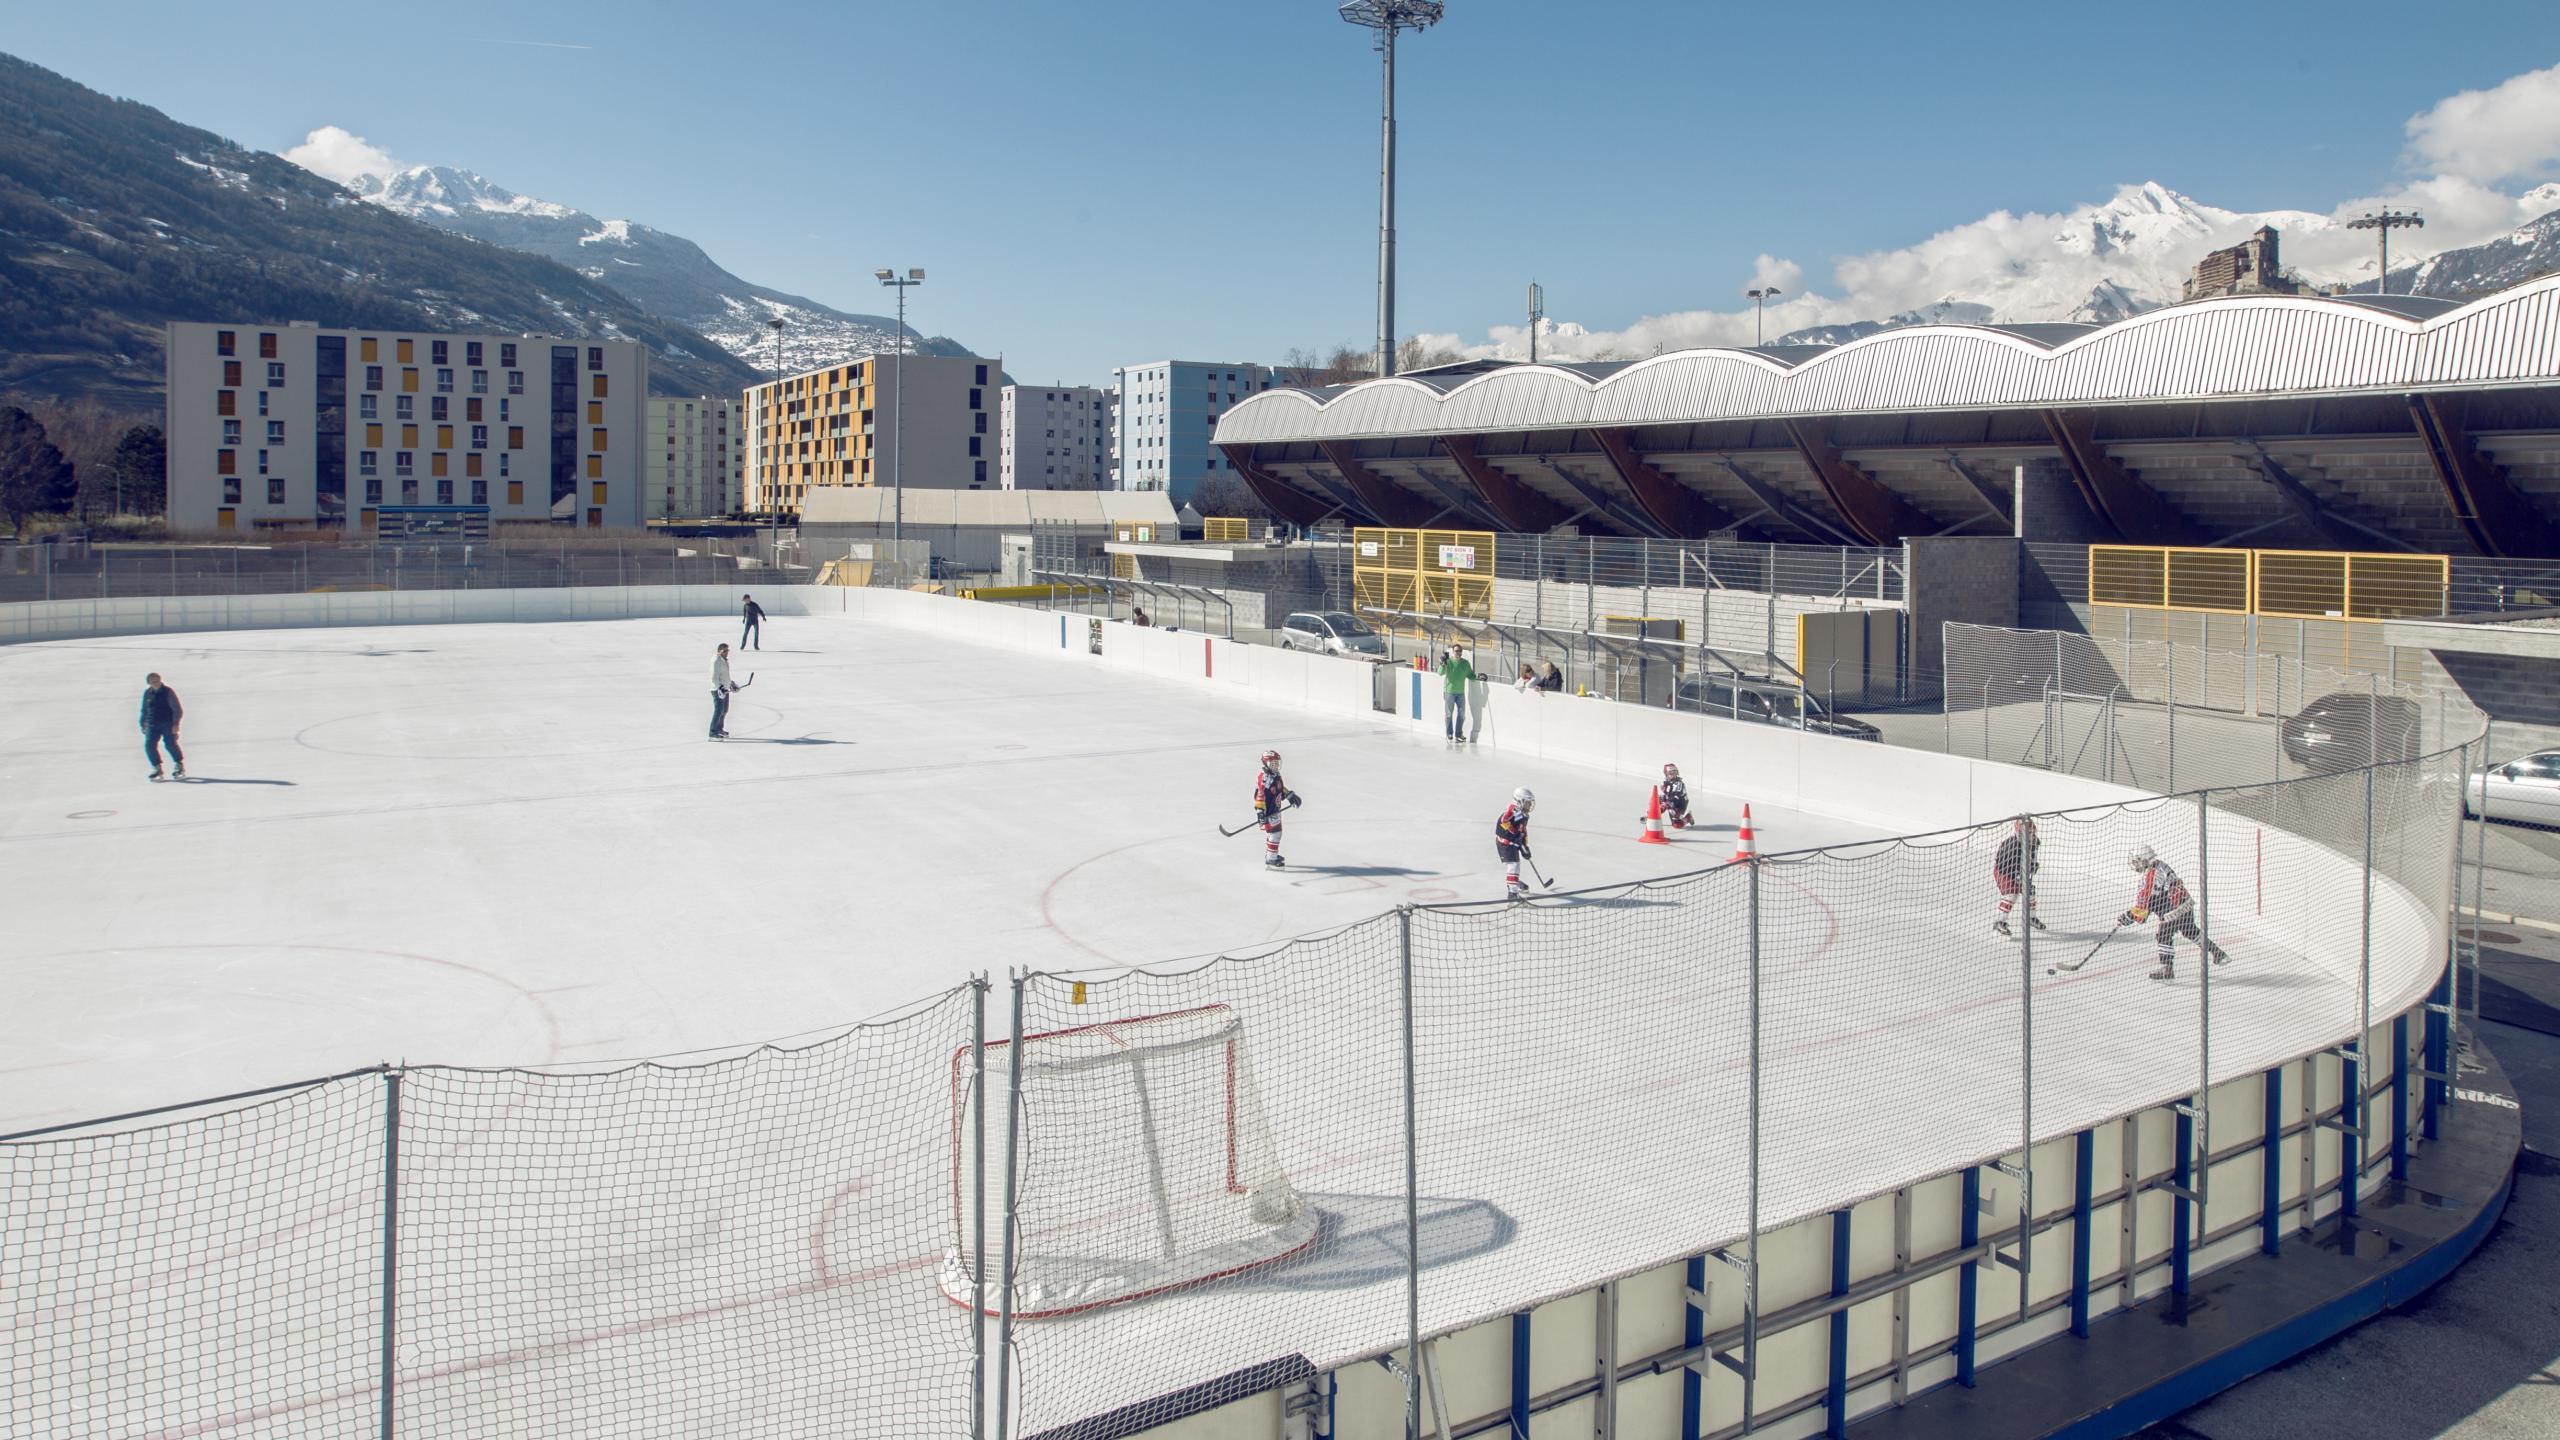 sportzentrum tourbillon ice skating in sion sitten valais